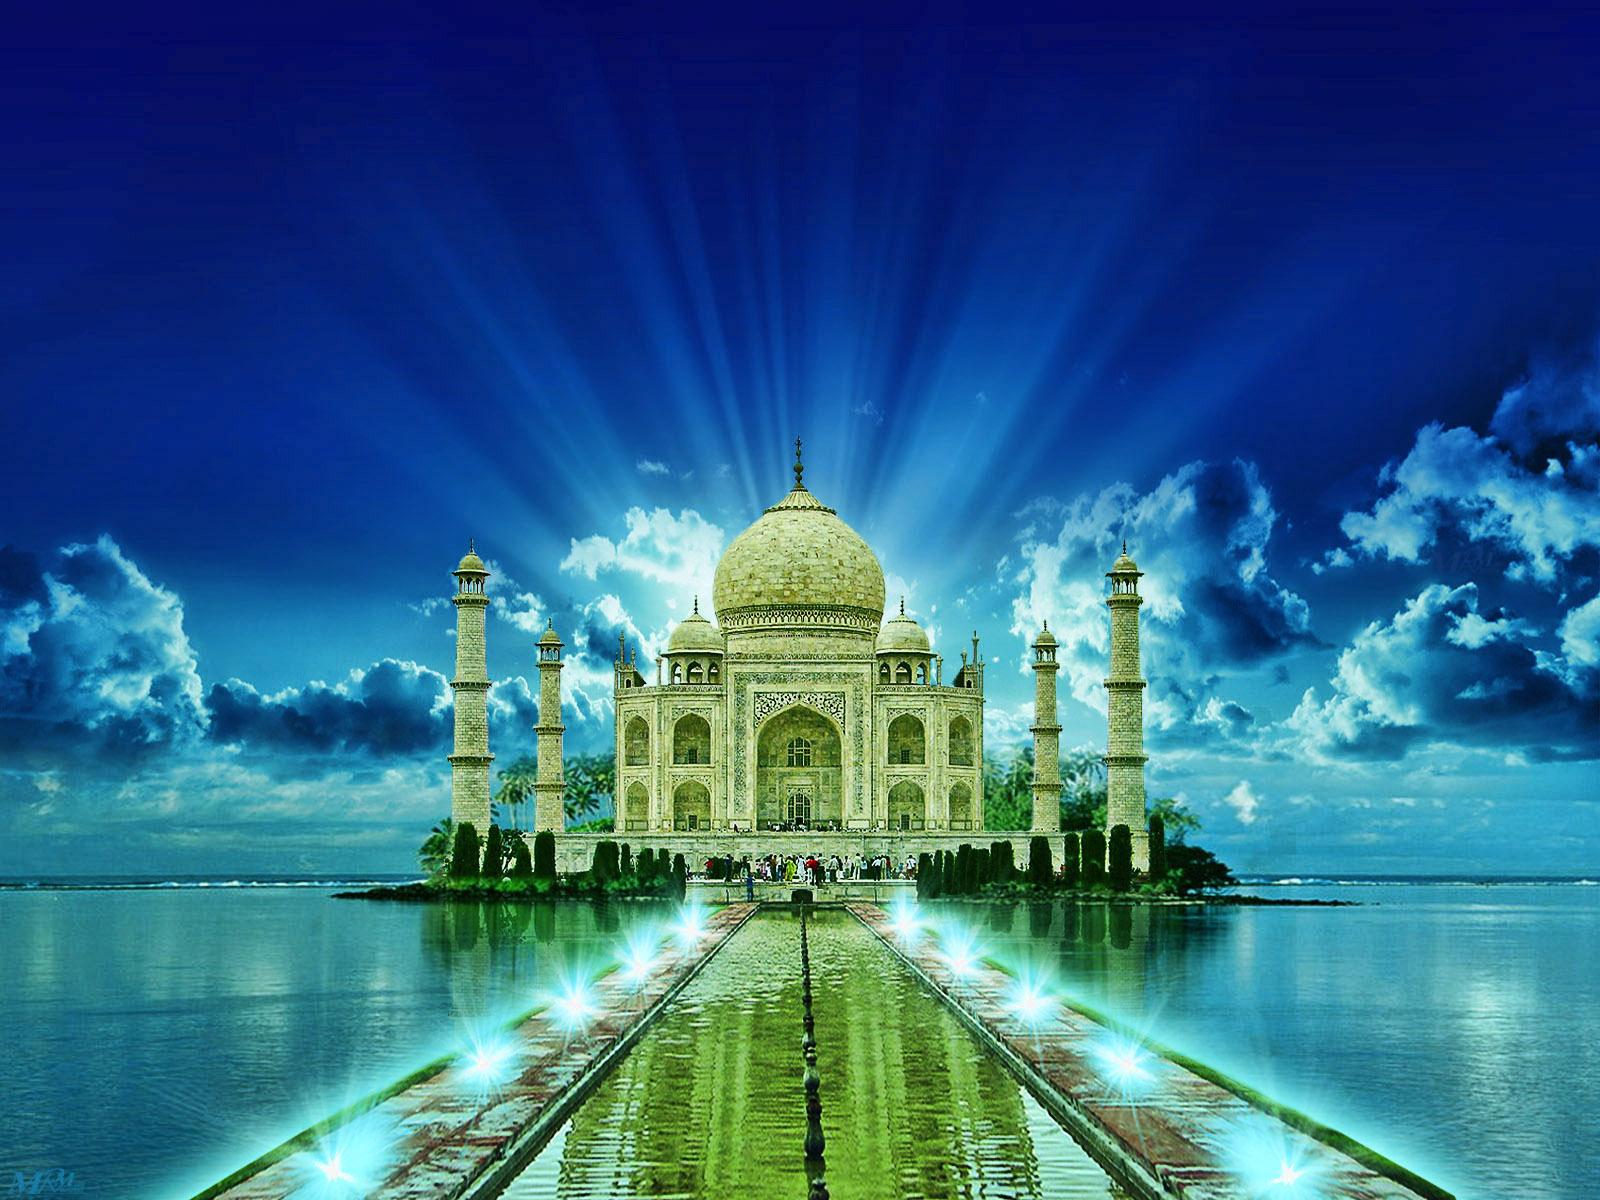 Hd wallpaper gallery - Hd Wallpaper Gallery Taj Mahal India Wallpaper